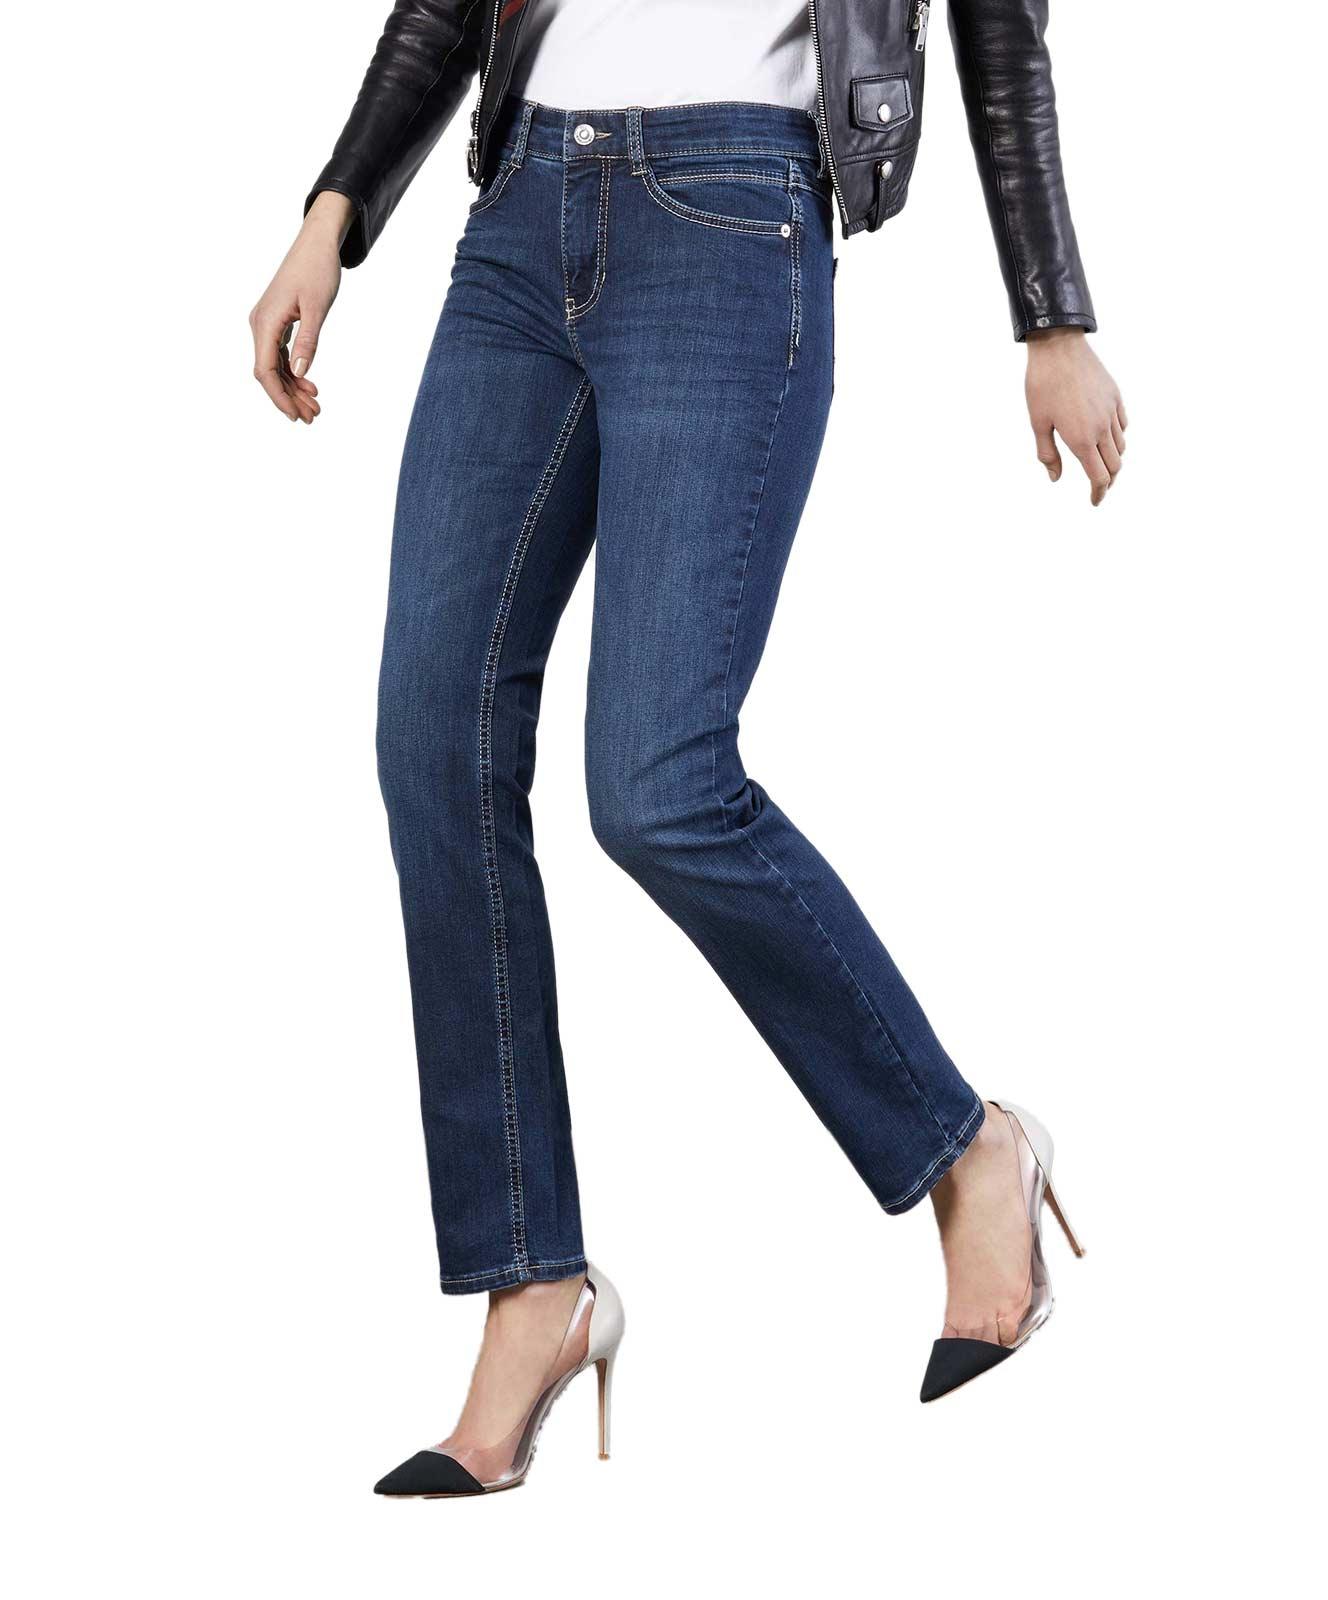 Hosen - MAC Slim Fit Jeans Angela in New Basic Denim  - Onlineshop Jeans Meile